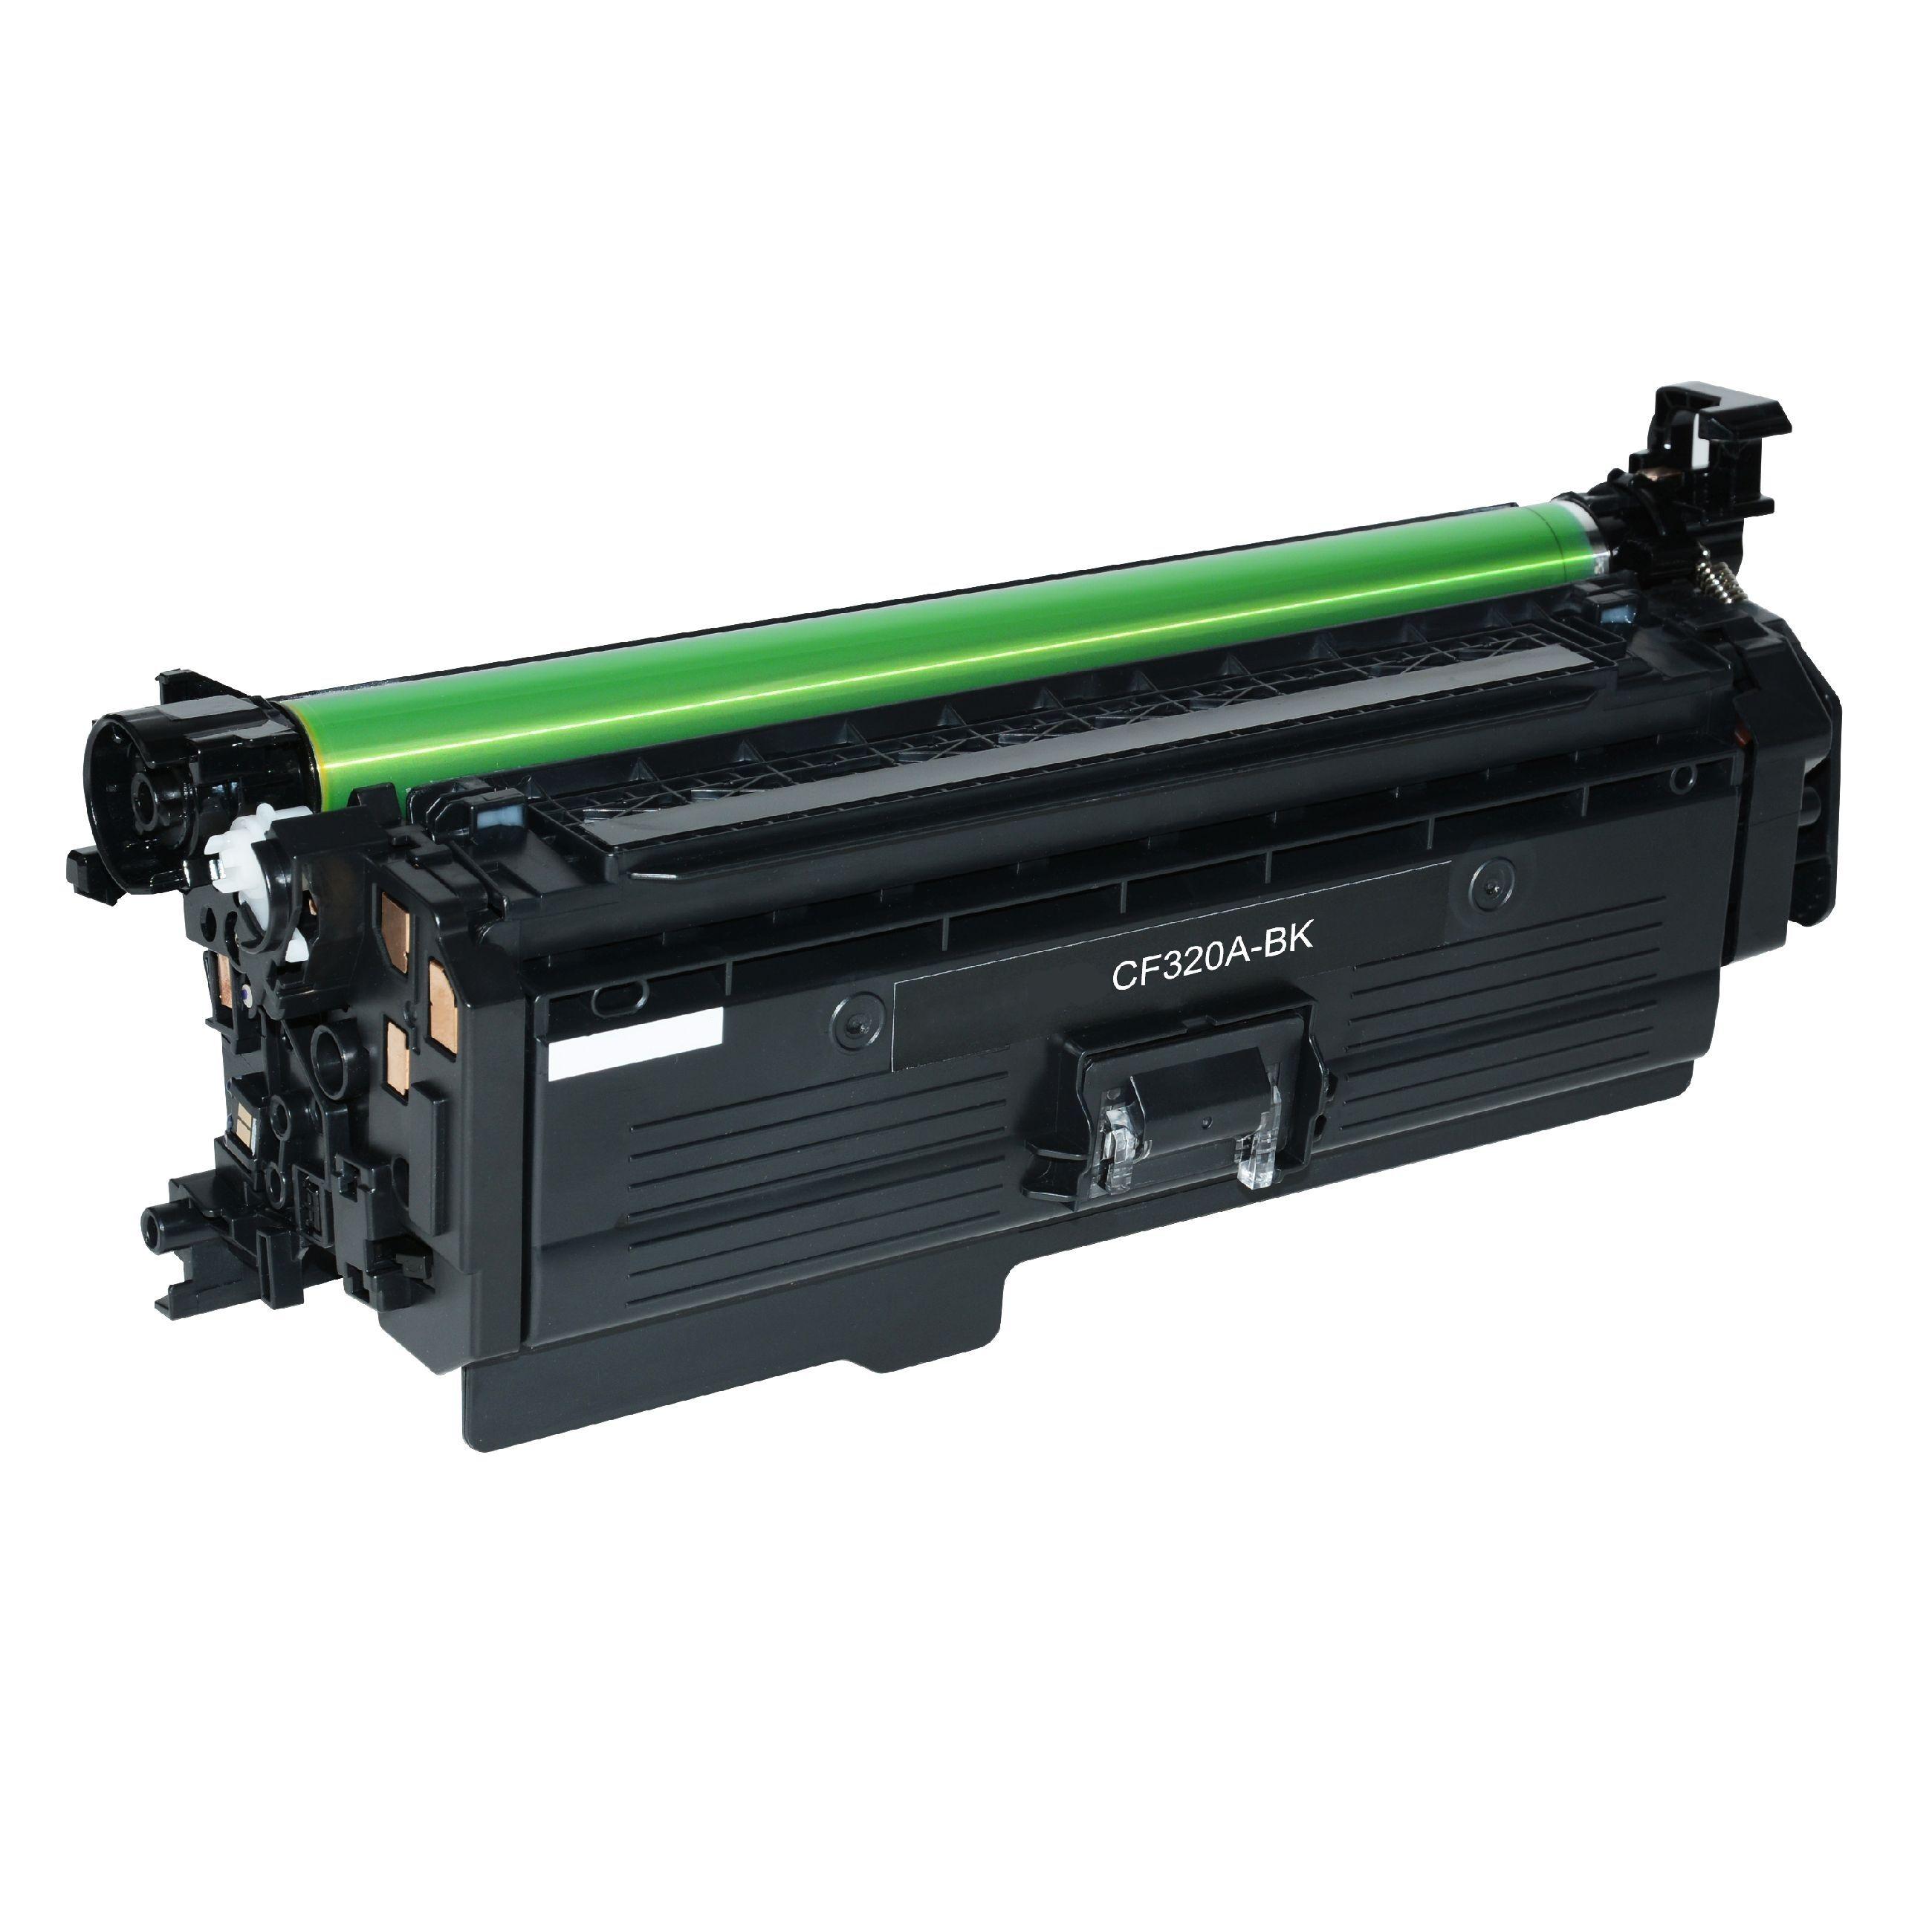 HP Cartouche de Toner pour HP CF320A / 652A noir compatible (de marque ASC)